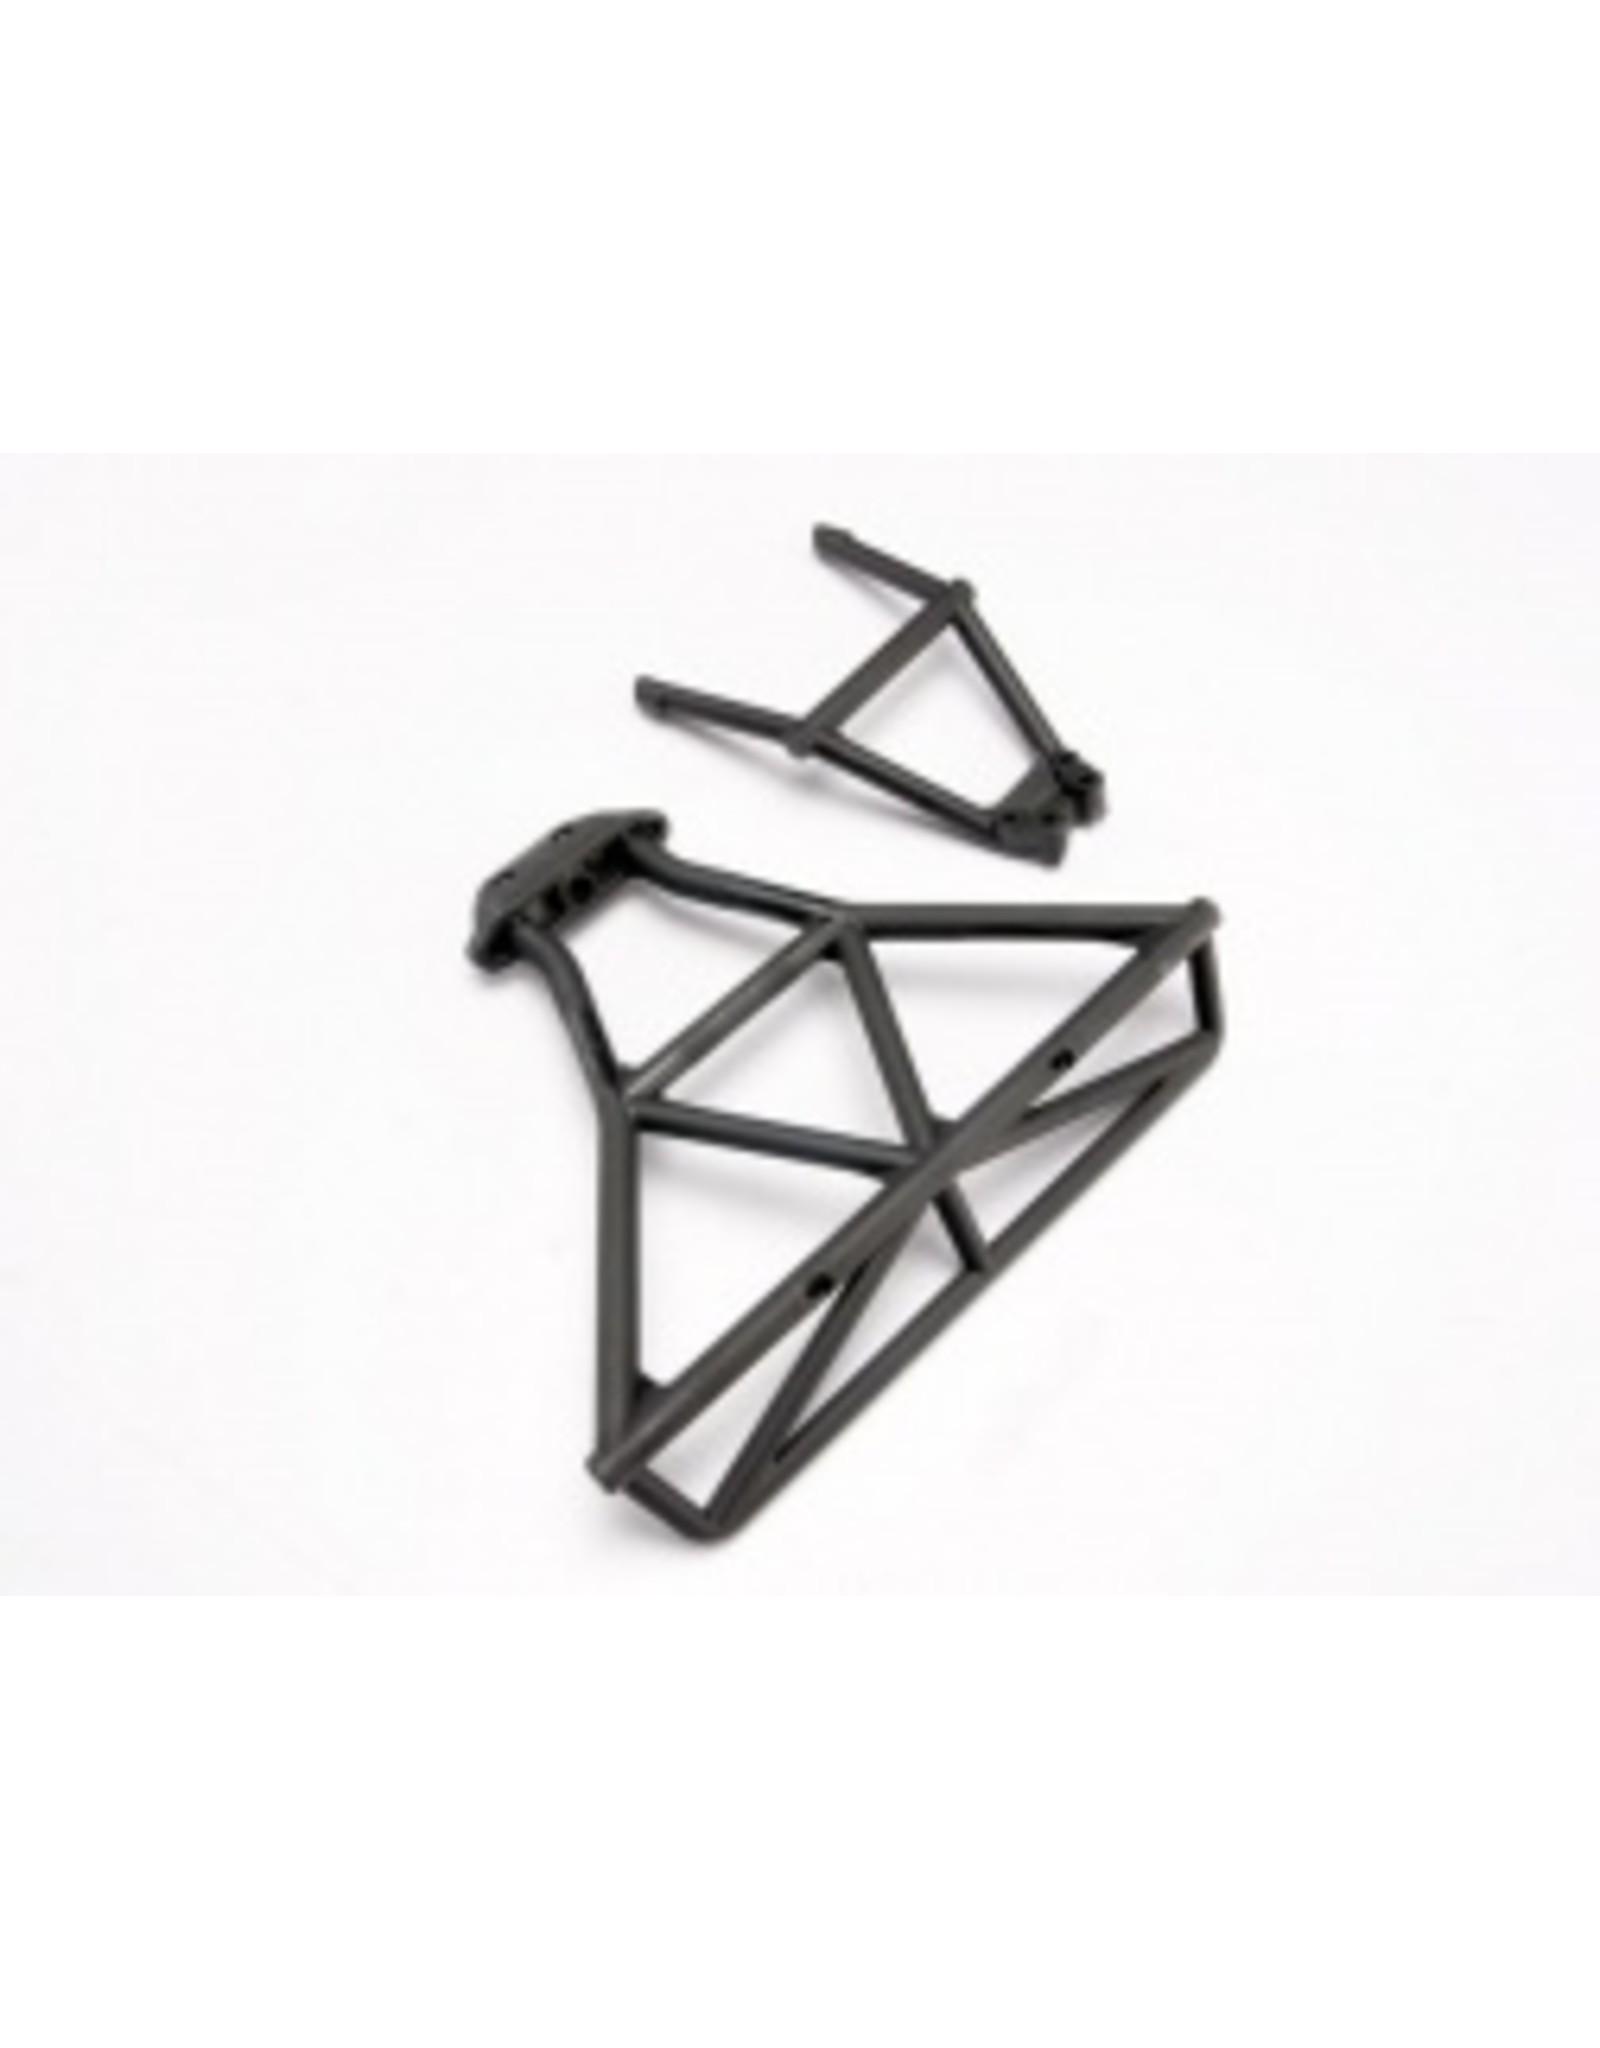 Traxxas Bumper, rear/ bumper mount, rear (black)  (TRA6836)